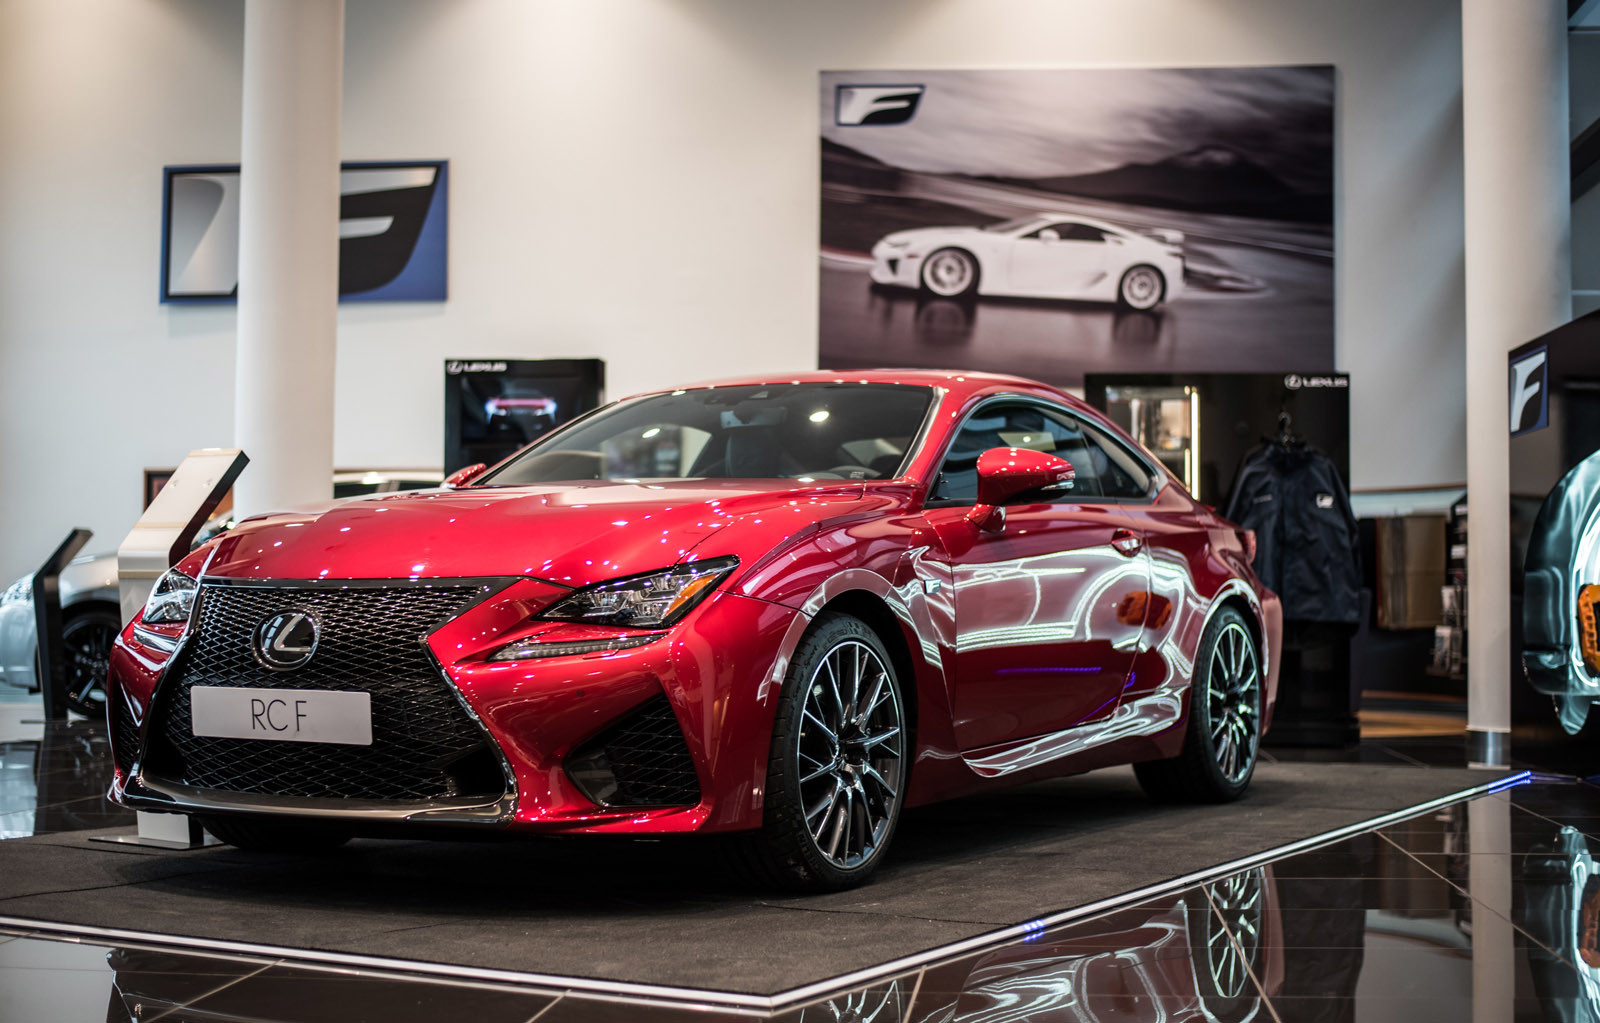 Lexus F Experience World Tour Spa-Francorchamps